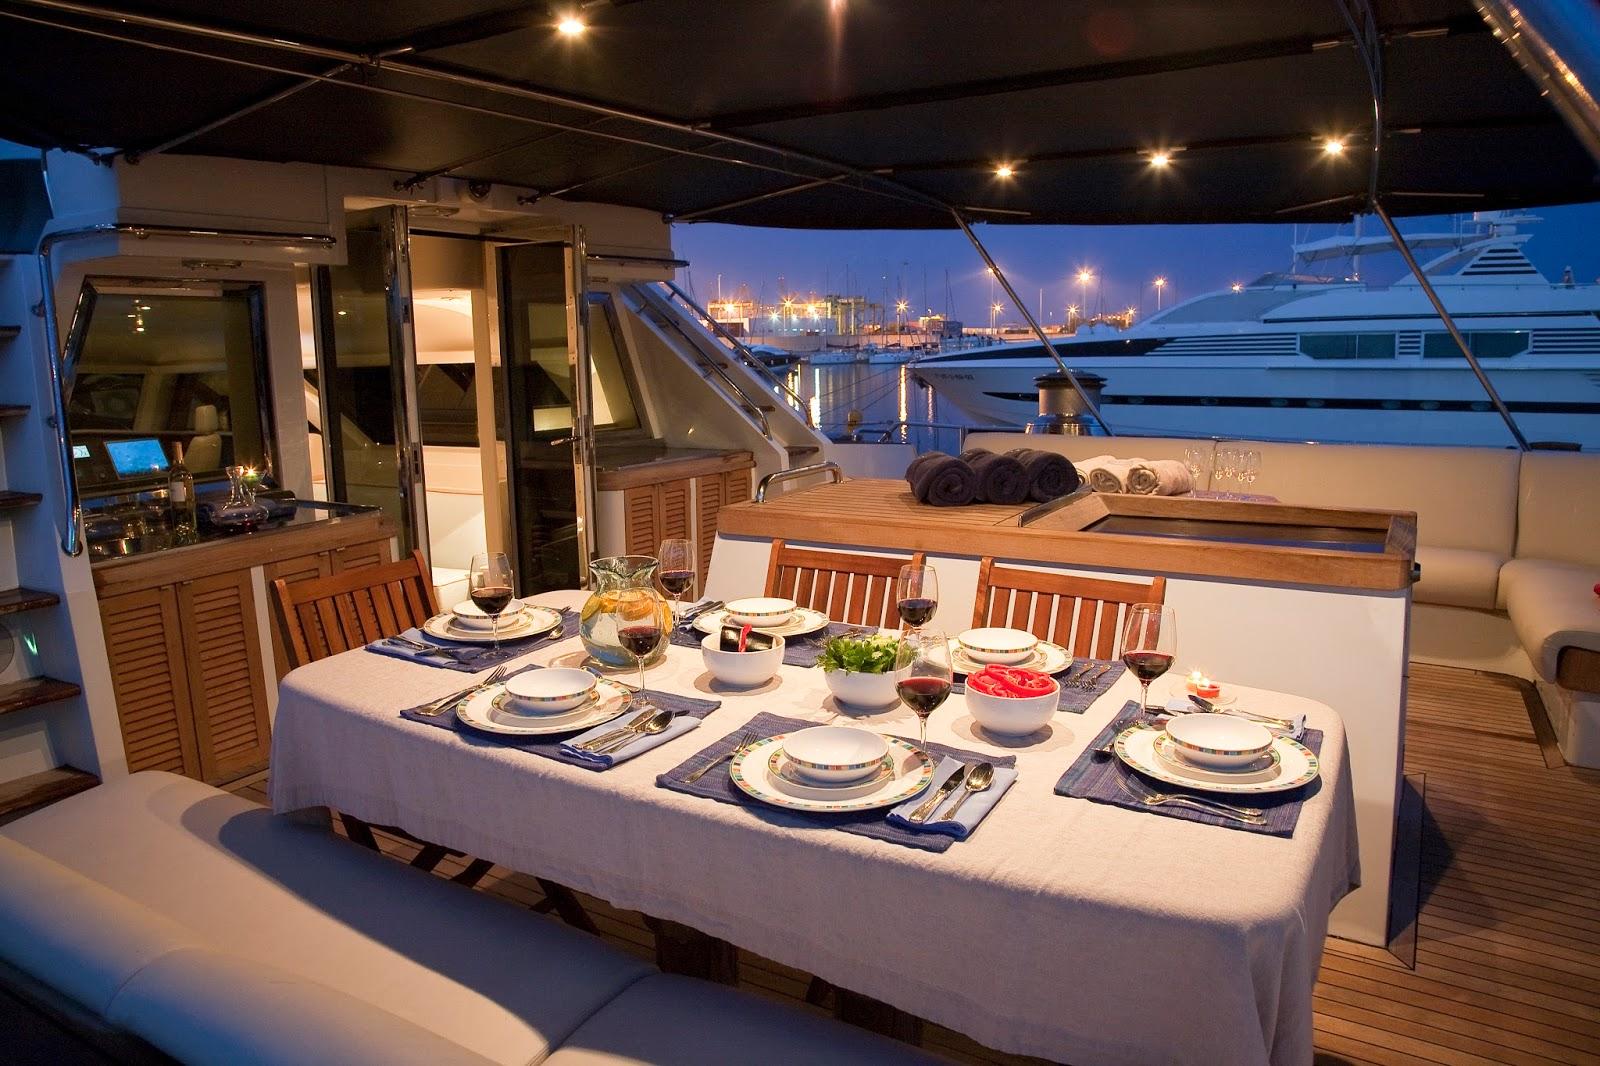 alquiler de veleros en ibiza alquiler veleros ibiza alquiler de catamaranes en ibiza